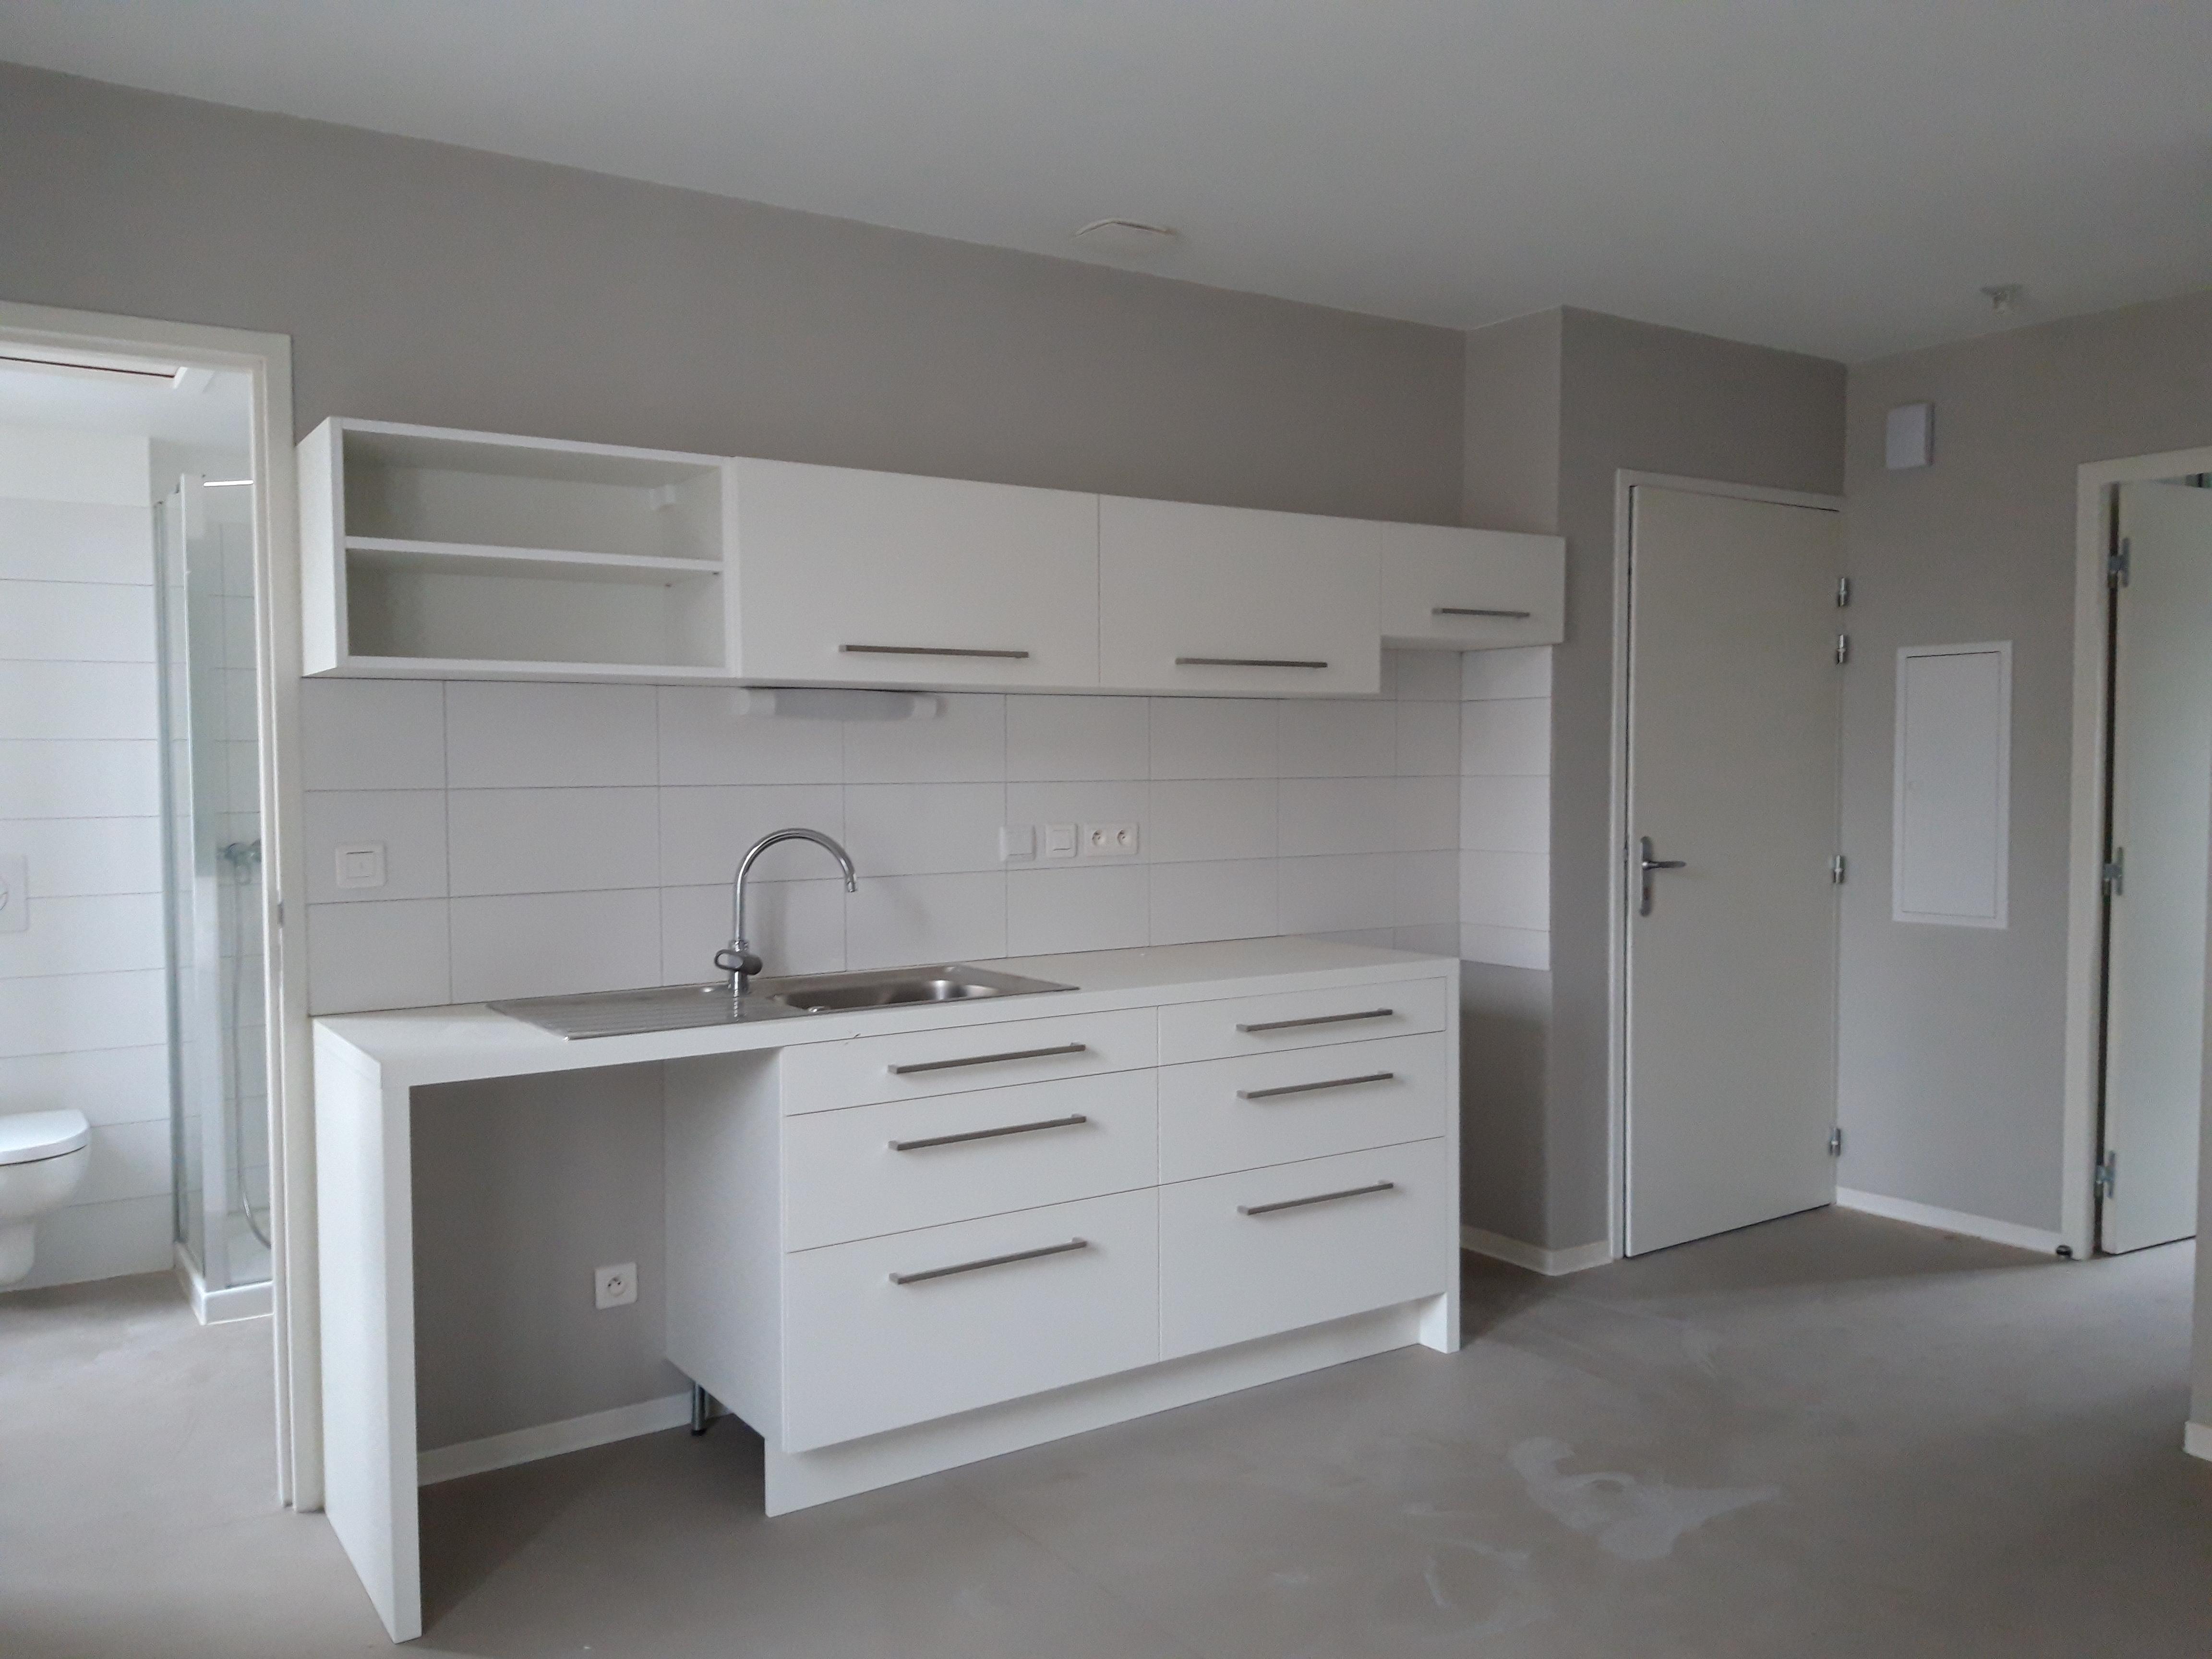 Appartement T2 neuf à louer à CAPDENAC